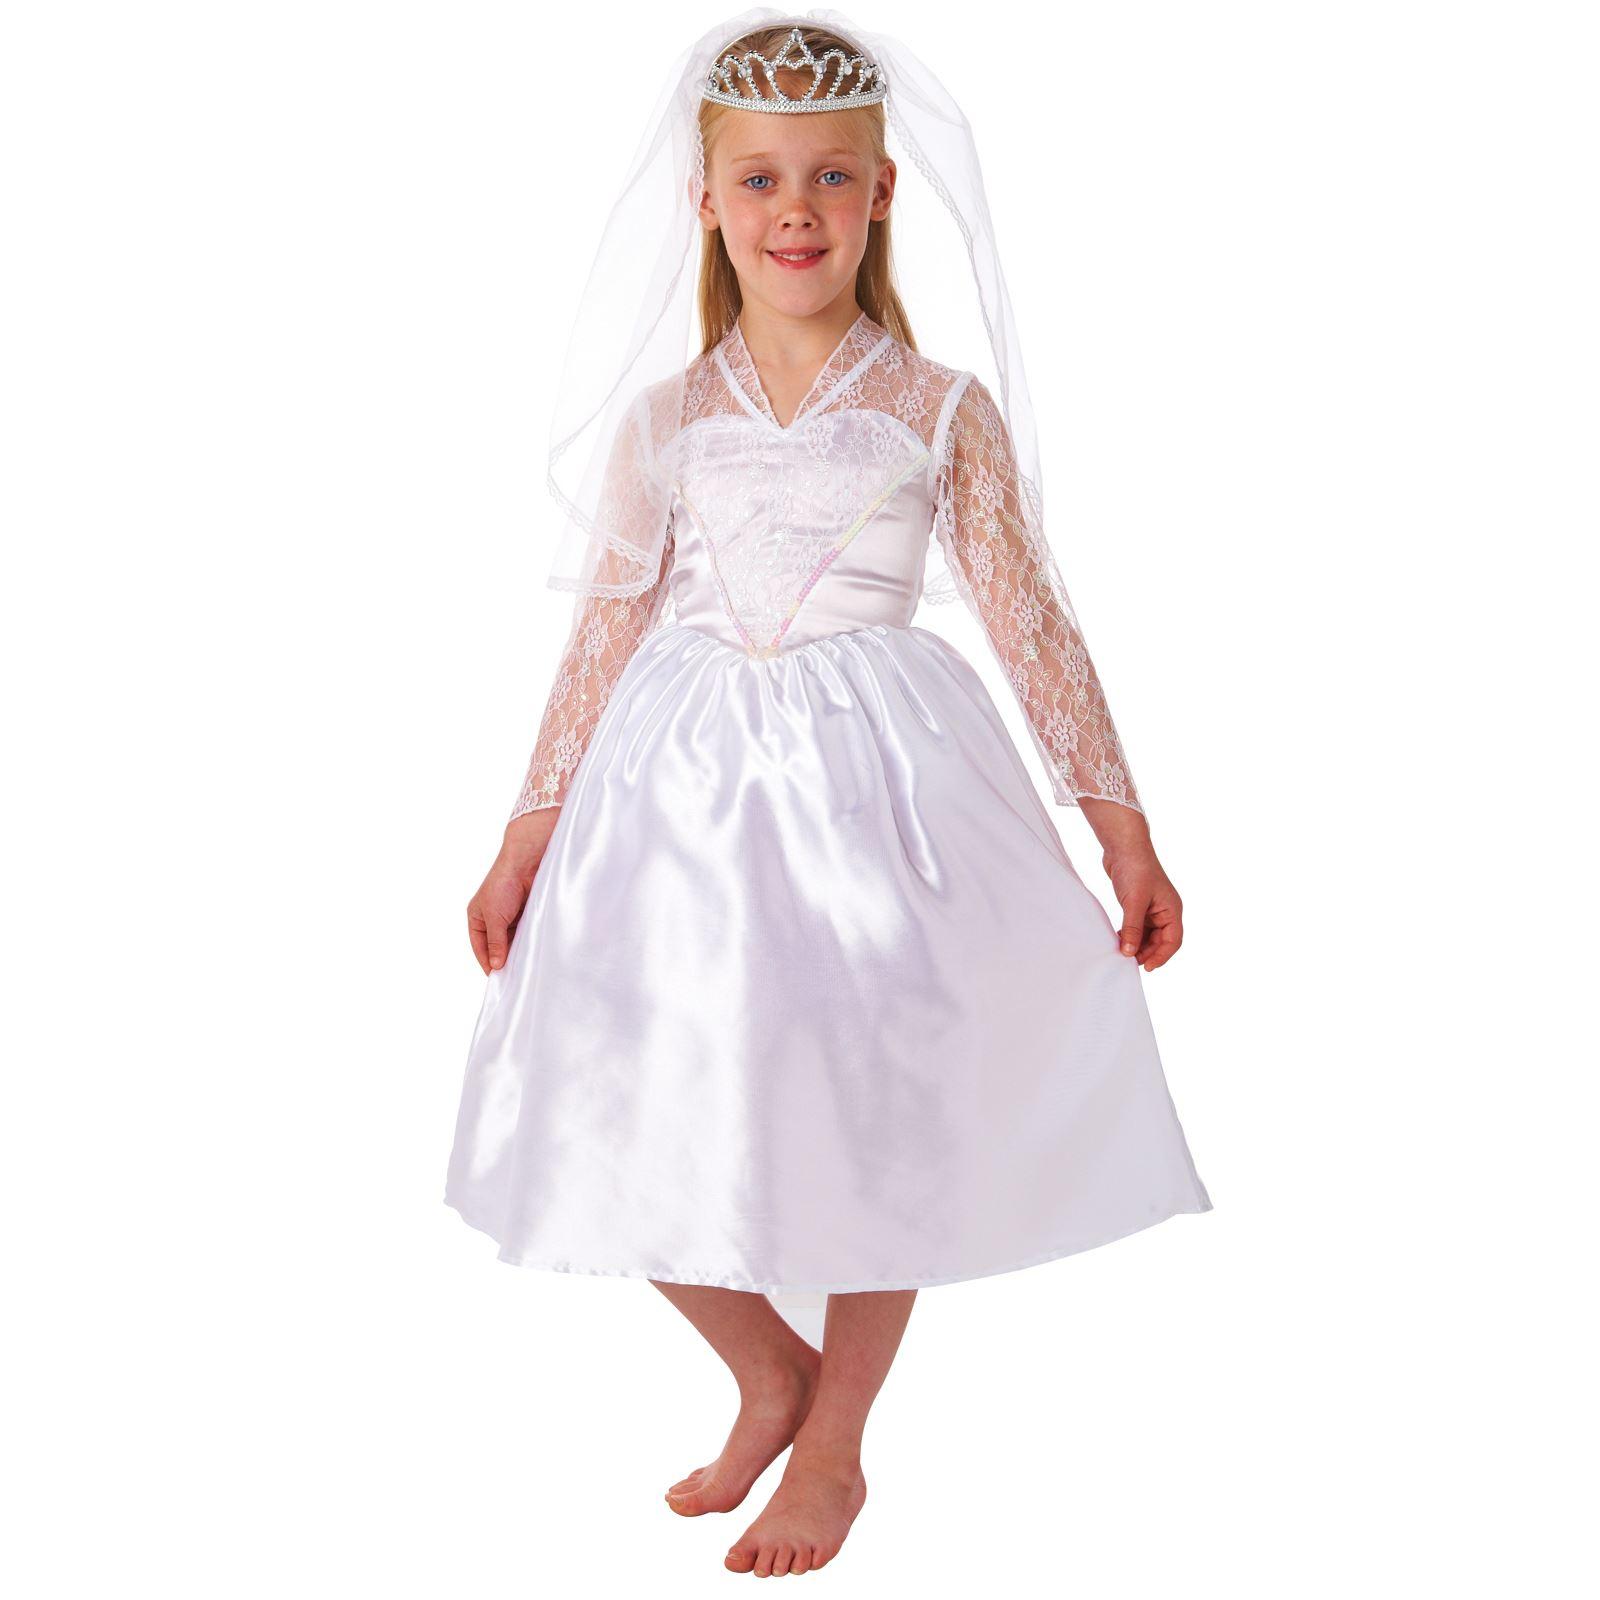 Halloween Girls Princess Fancy Dress Up Costume Outfits: Girls Bride Princess Fairy Christmas White Fancy Dress